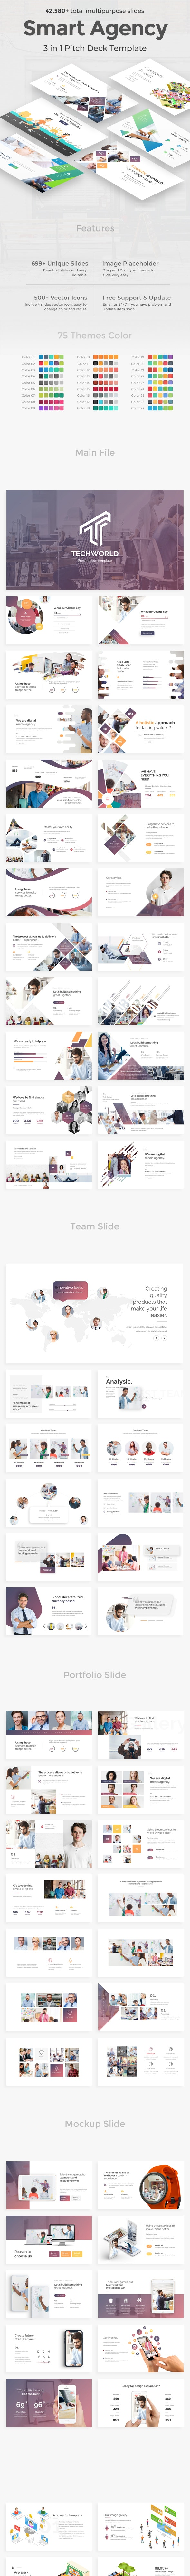 Smart Agency 3 in 1 Pitch Deck Keynote Bundle Template - Business Keynote Templates